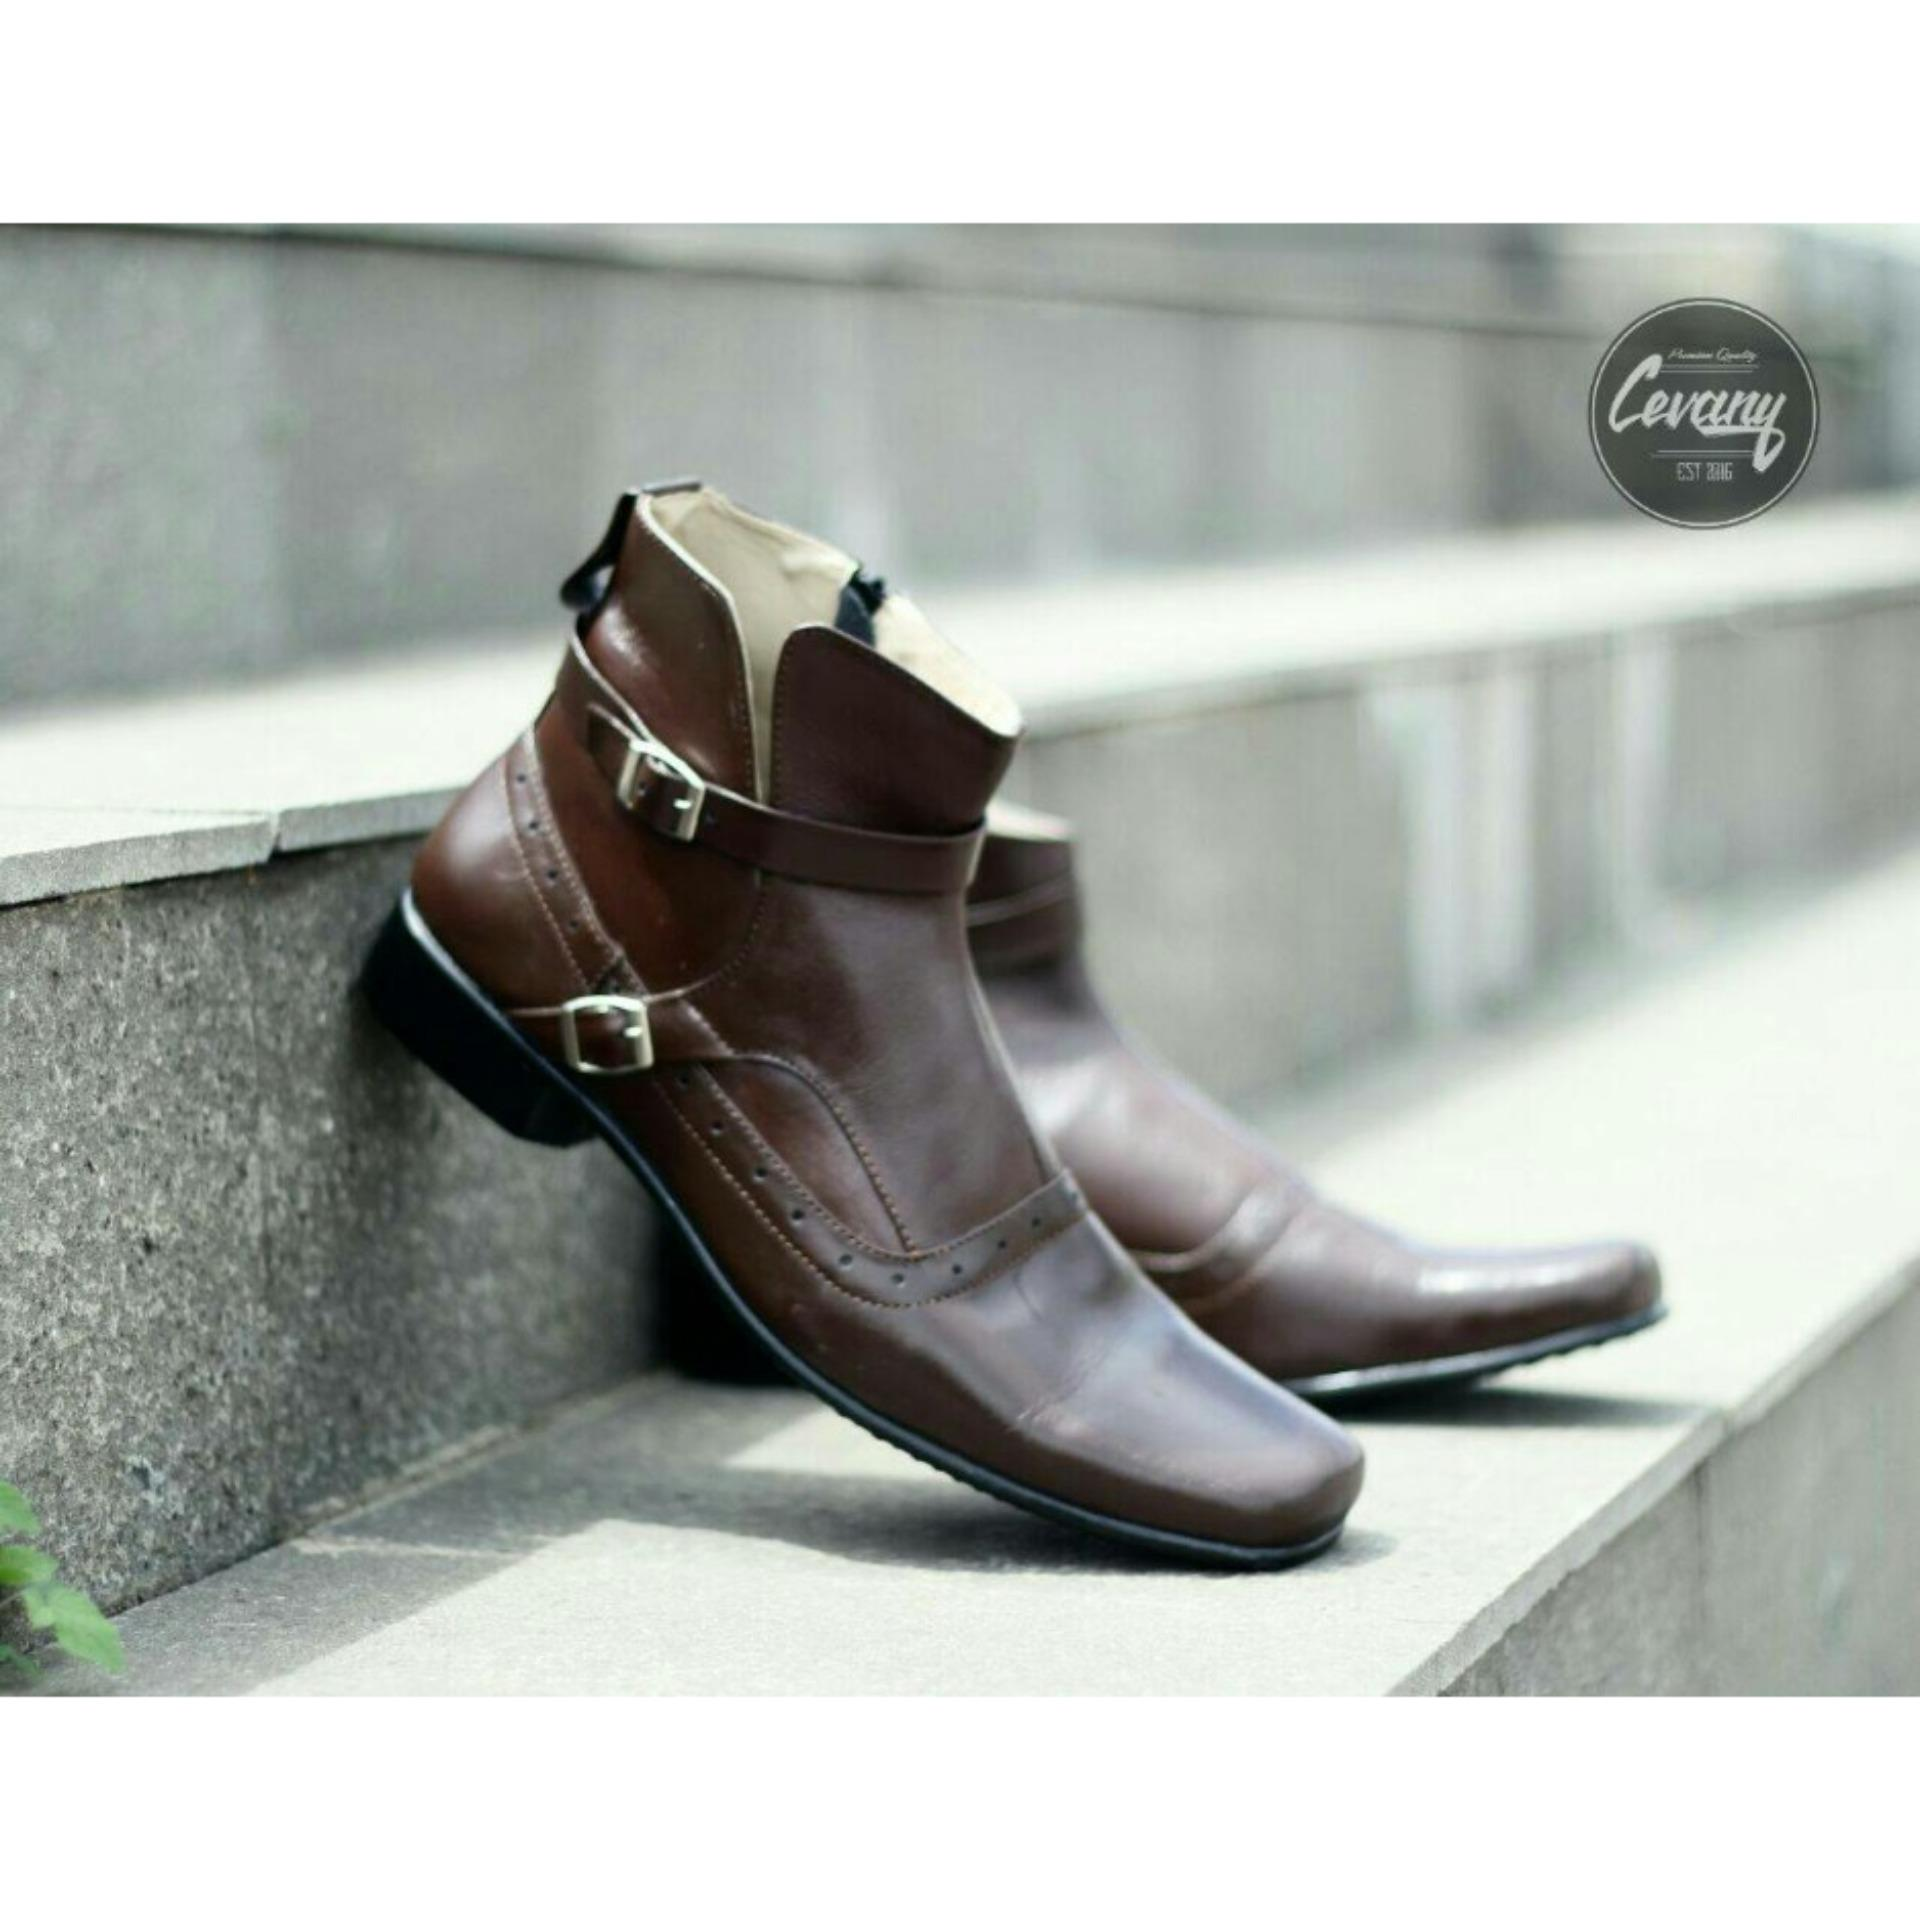 Fitur Cevany Leather Shoes Man Formal Elegan Sepatu Pantofel Kulit Pantopel Veil Asli Orginal Premium Quality